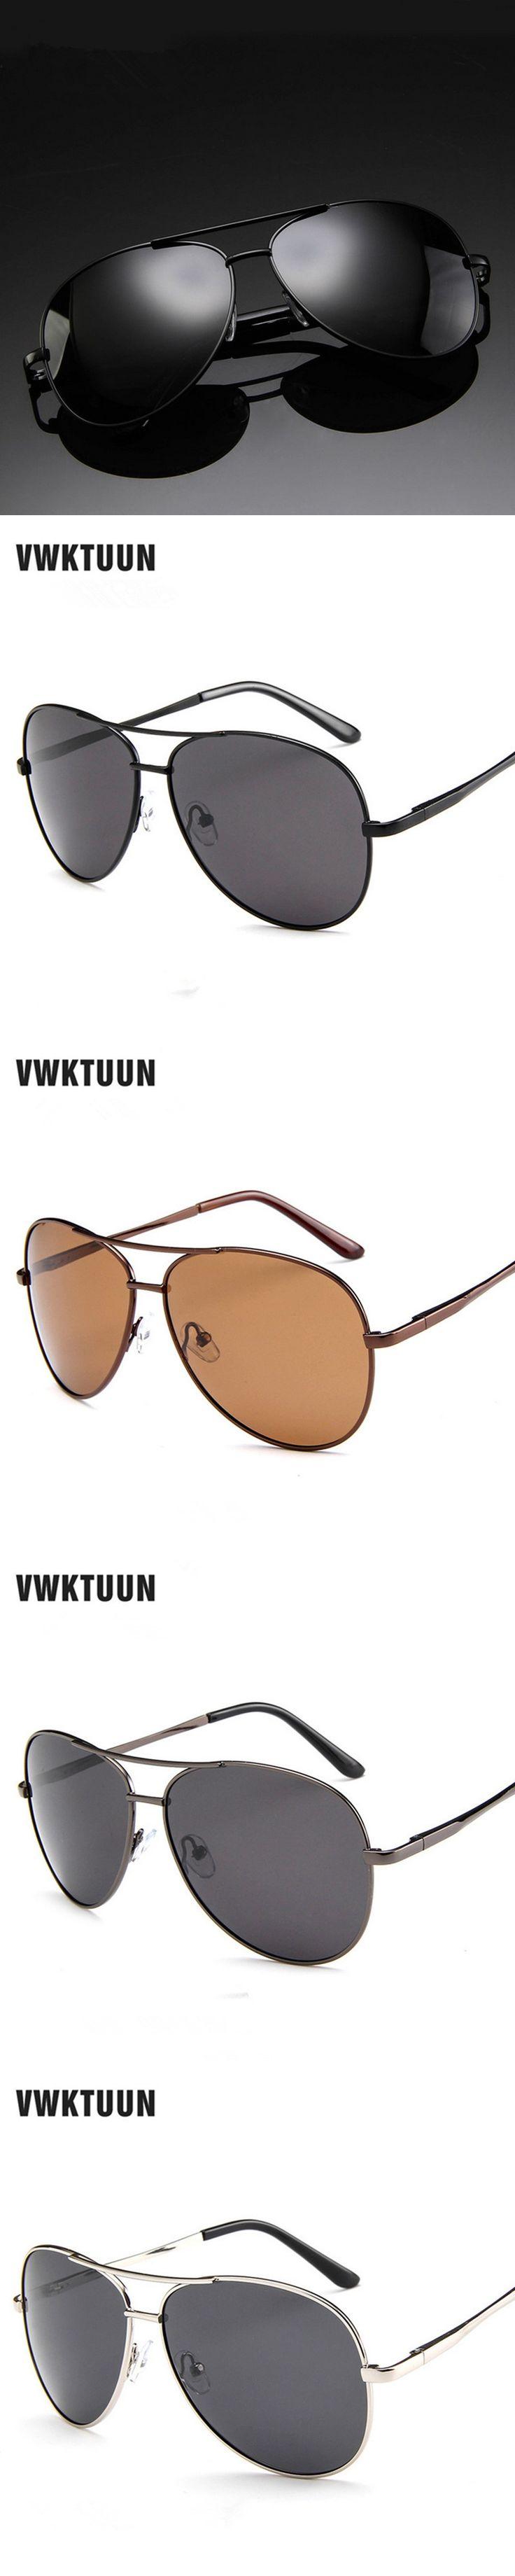 VWKTUUN Pilot Polarized Sunglasses Men Drivier Fishing Sun glasses For Mens Sports Outdoor Eyewear HD Lens Goggles Sun Shades